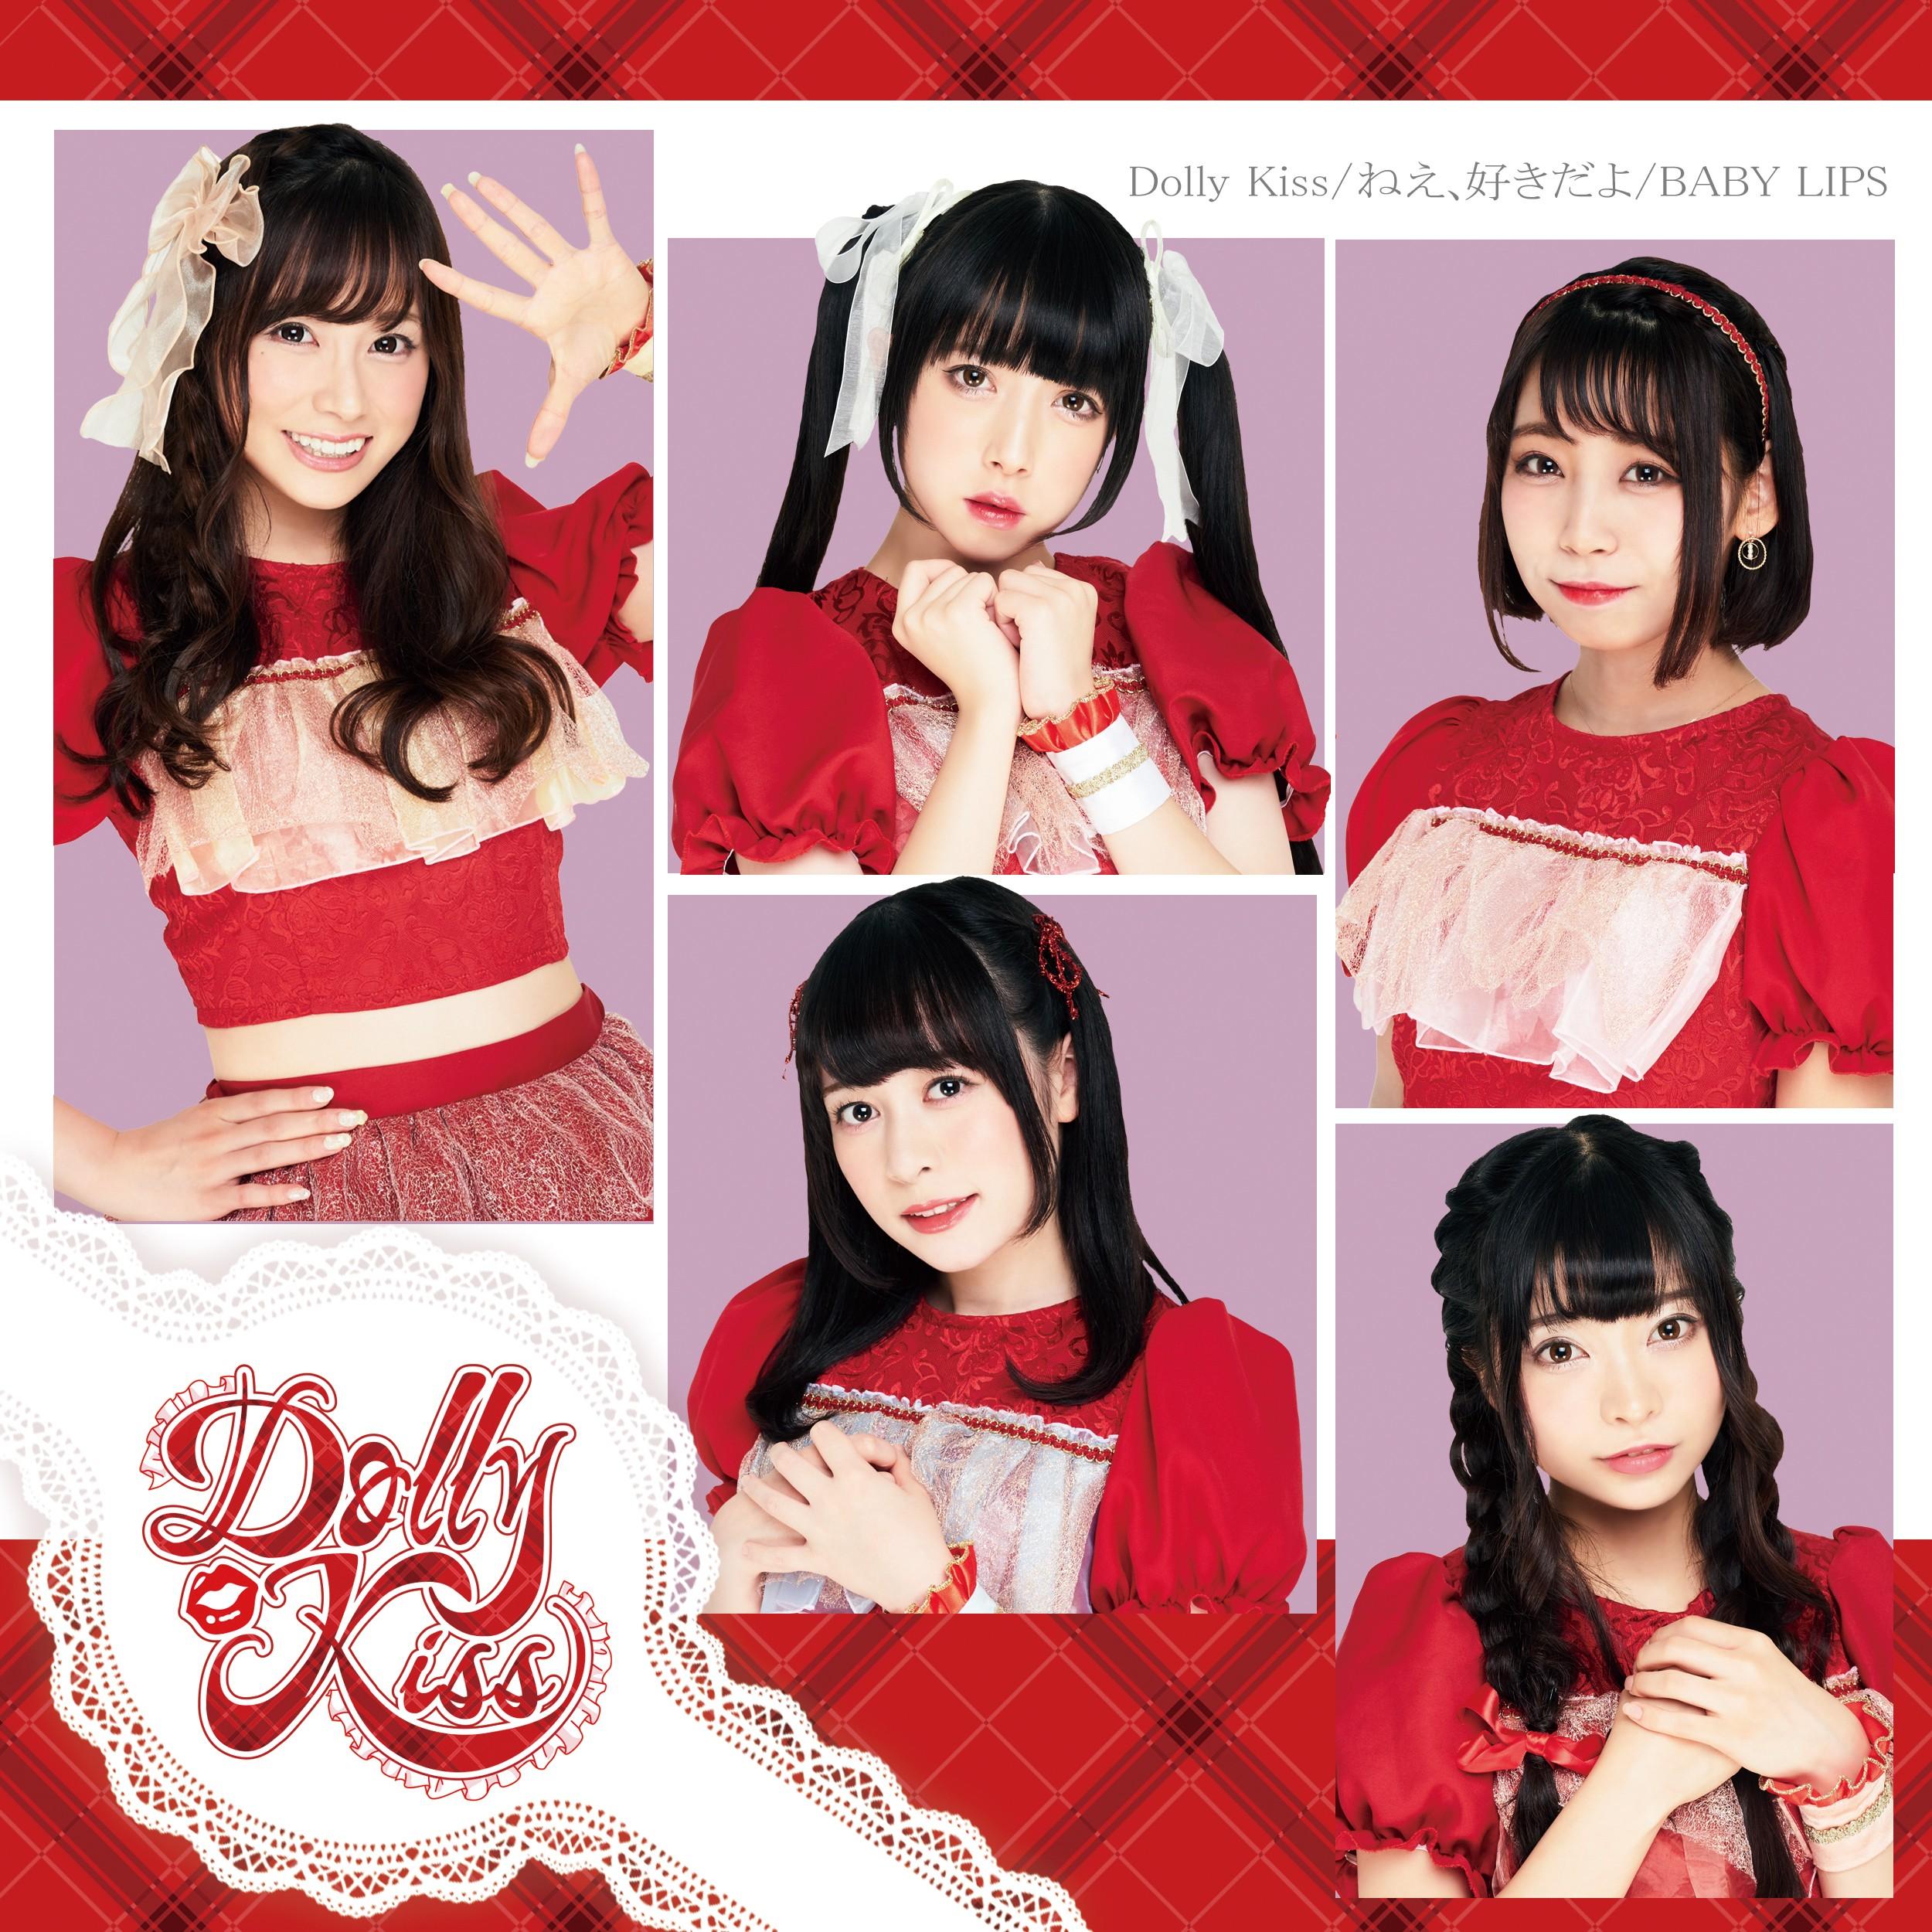 Dolly kiss / Nee, Suki Dayo / BABY LIPS